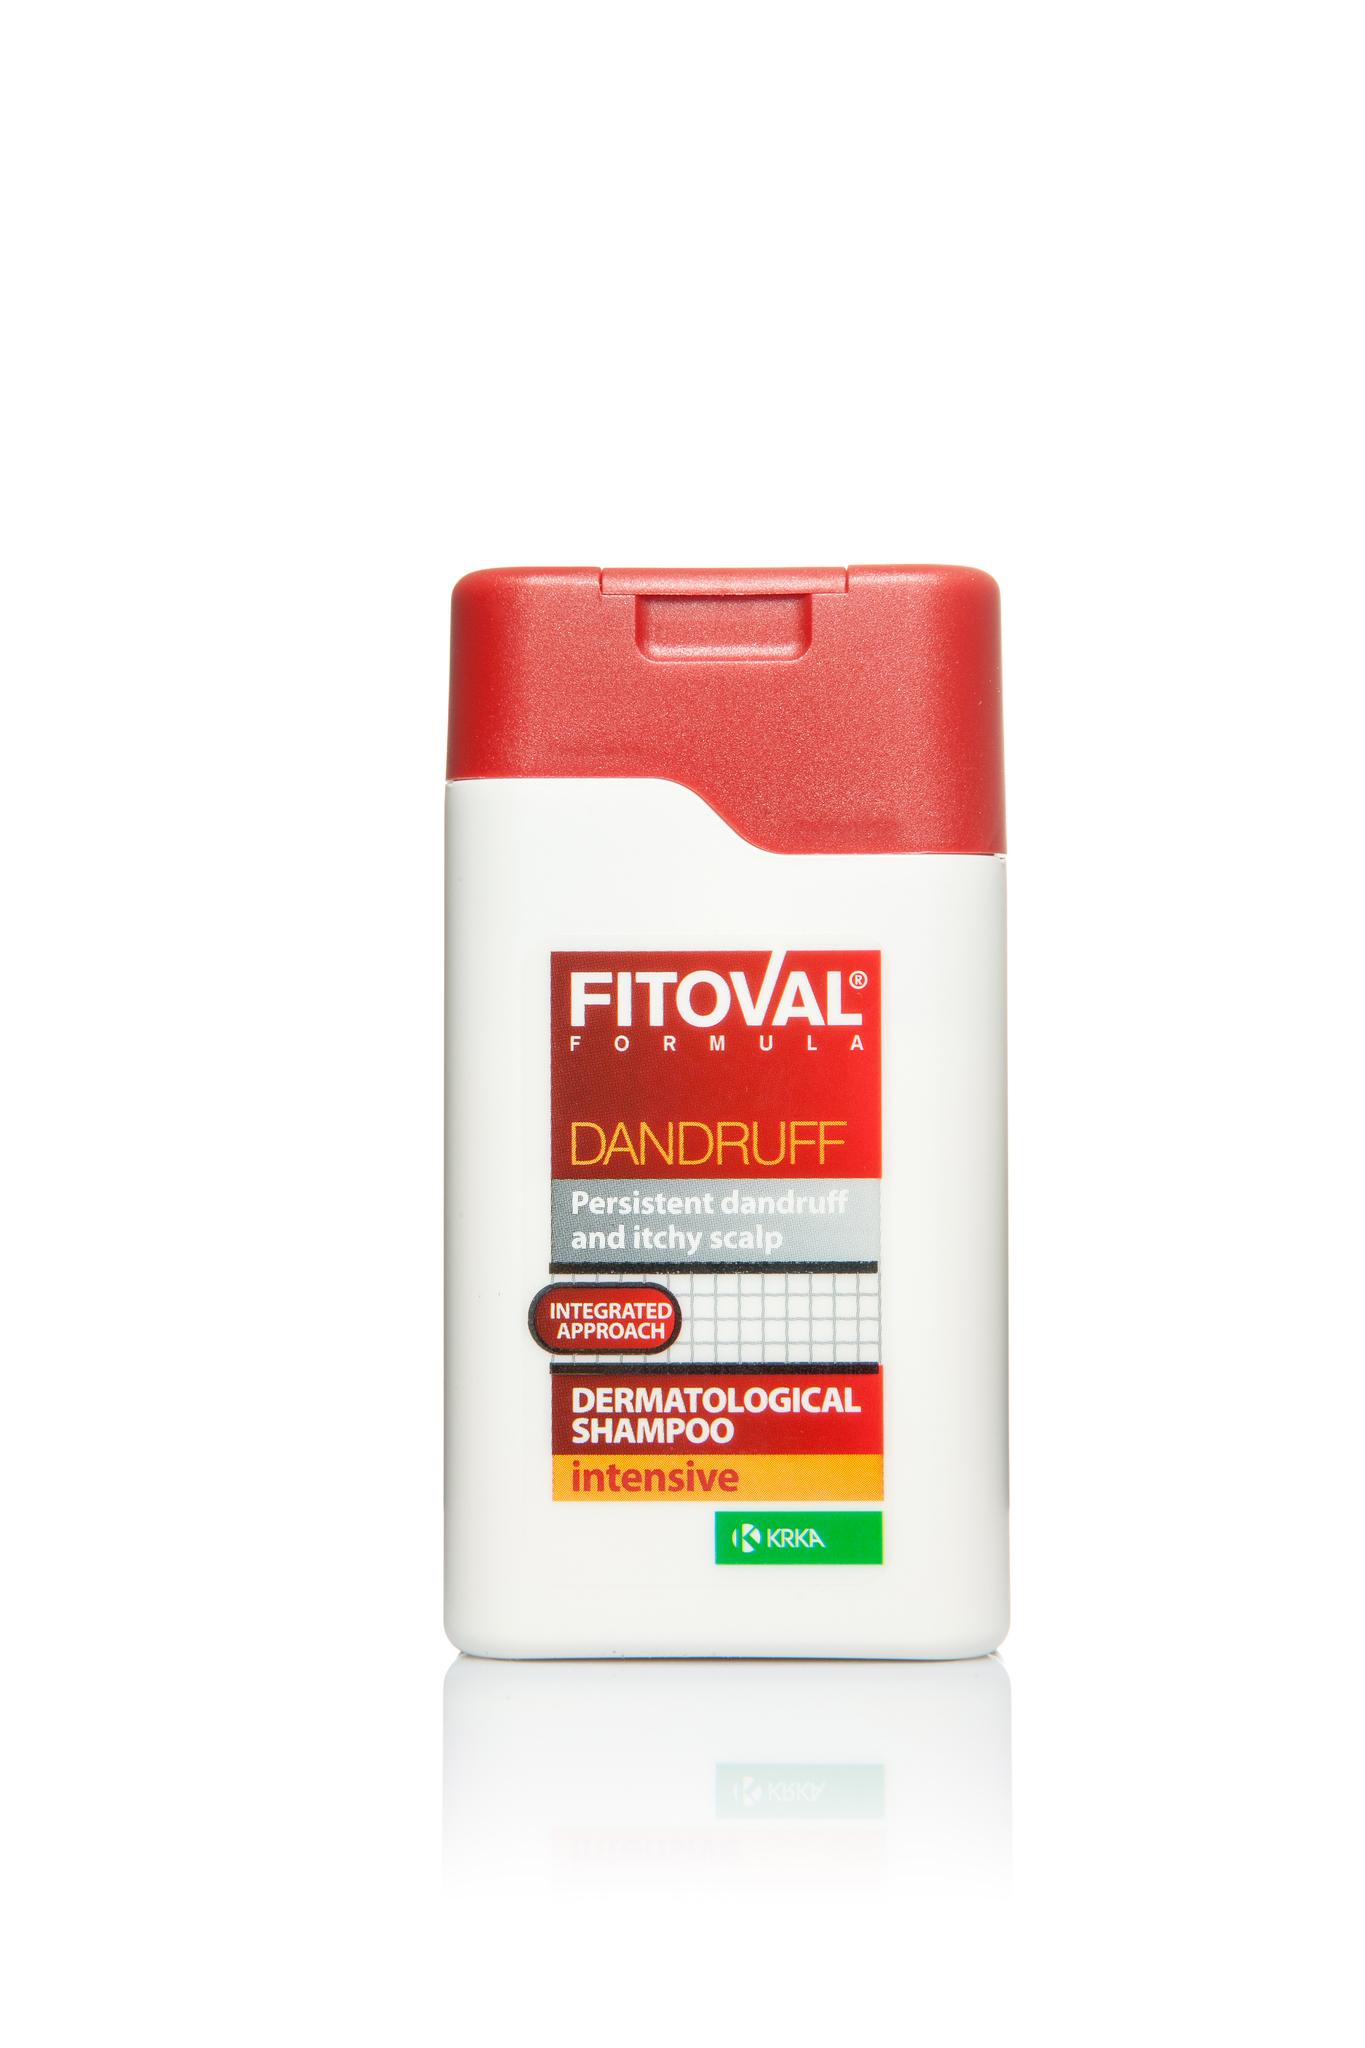 Fitoval formula шампунь для интенсивного ухода 100 мл.